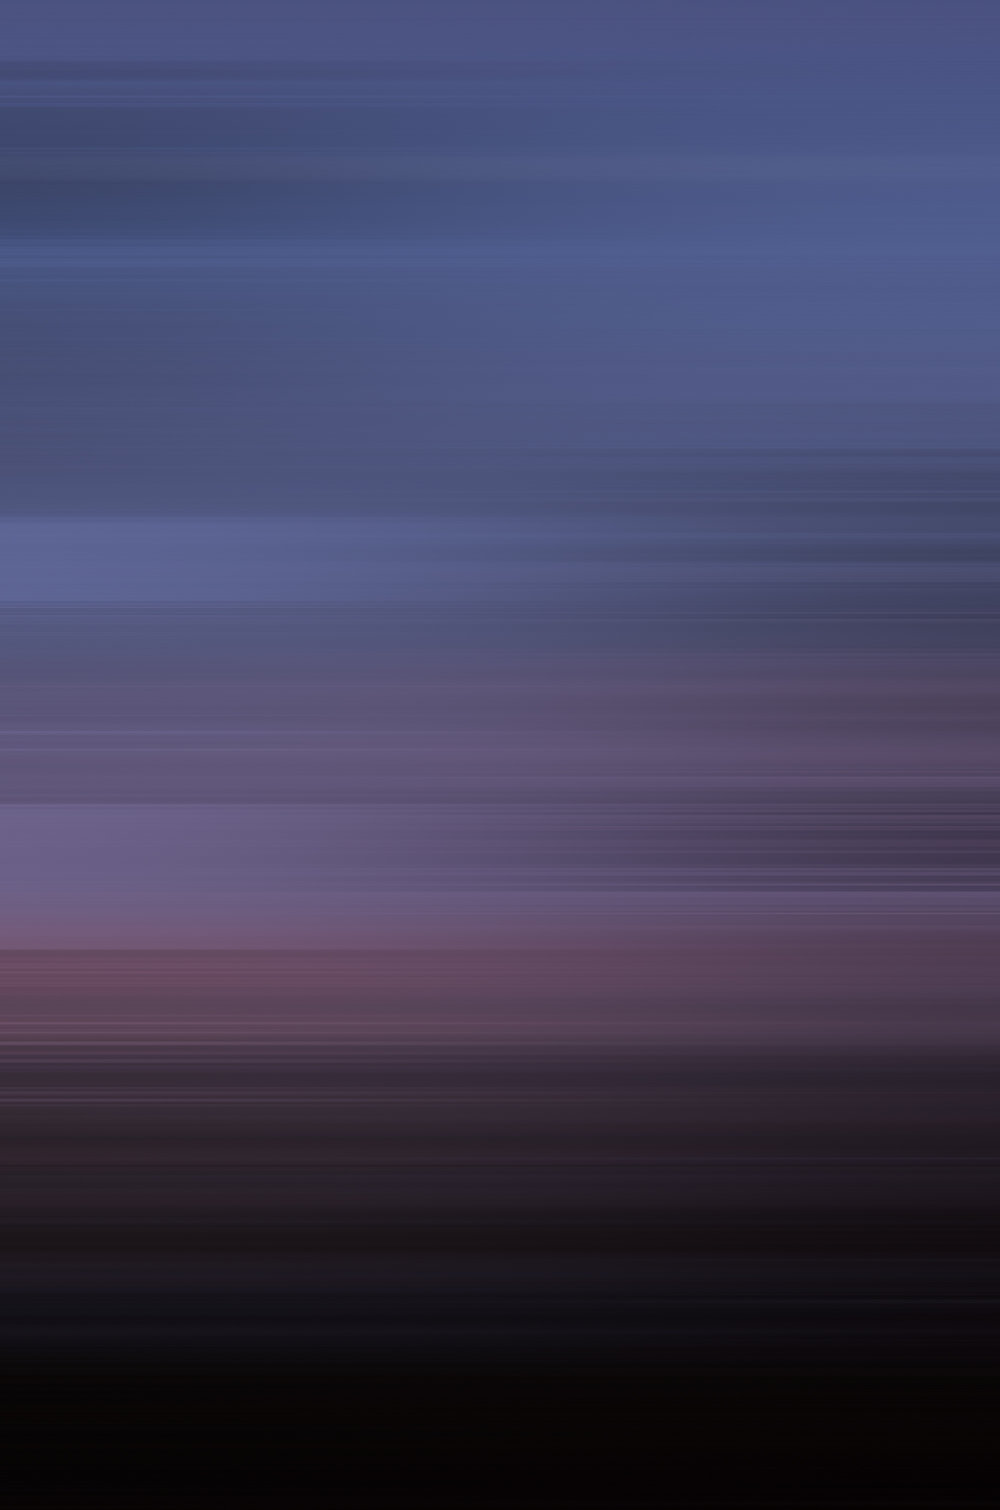 Weston James Palmer-Motion-177.jpg